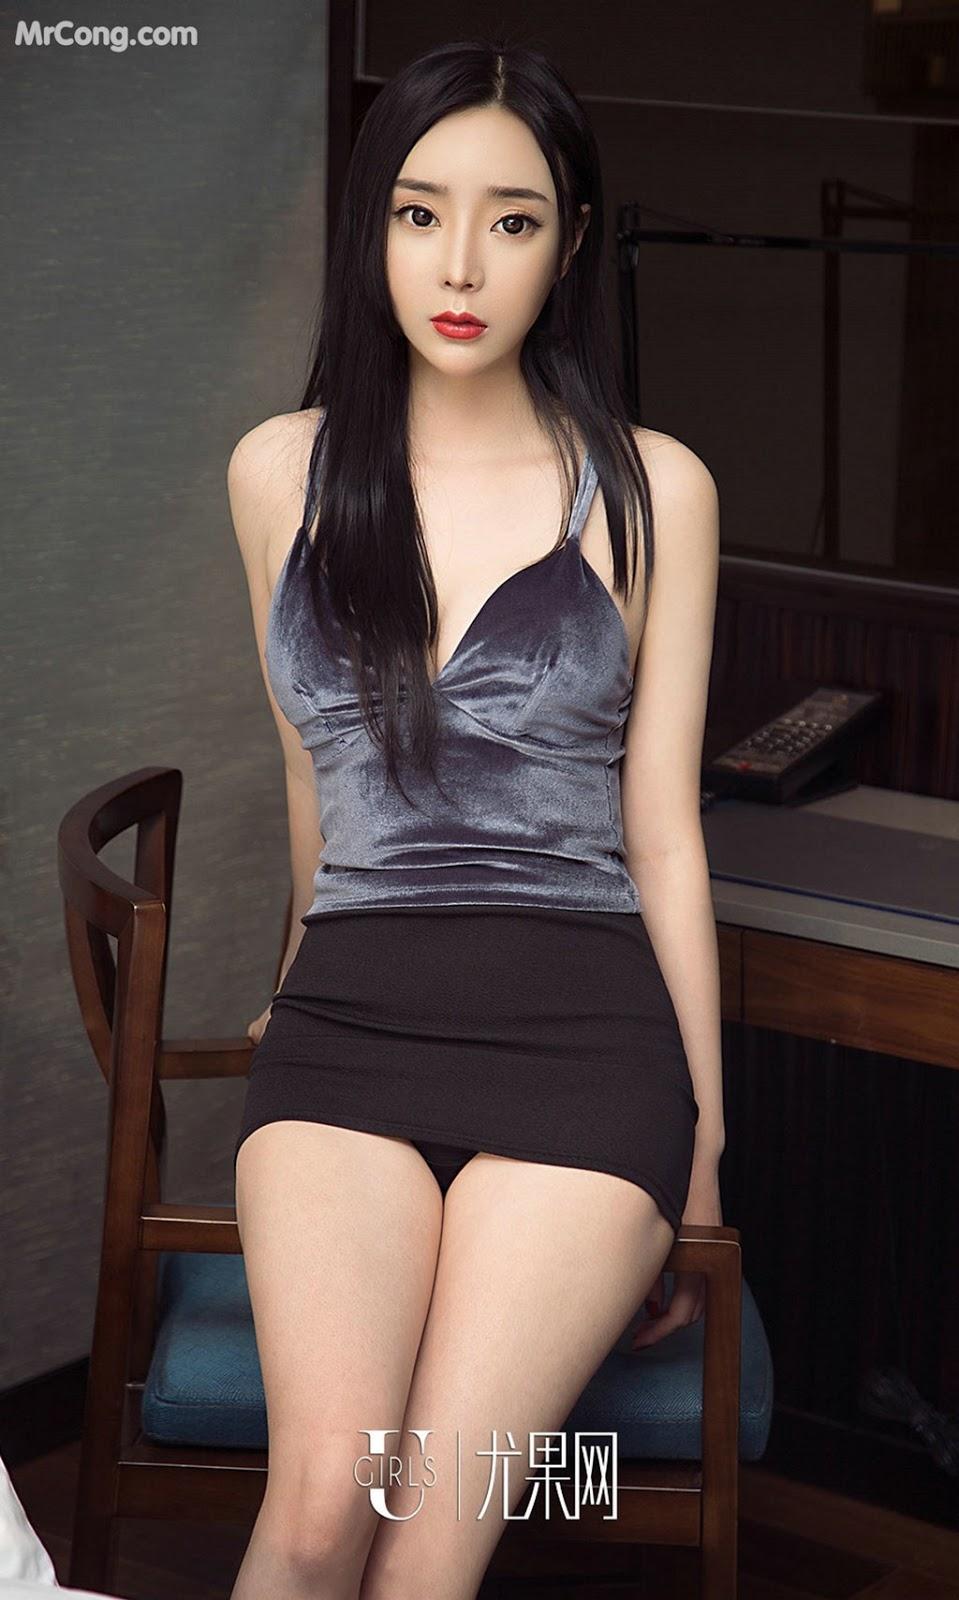 Image UGIRLS-Ai-You-Wu-App-No.1387-Ai-Mi-Er-MrCong.com-006 in post UGIRLS – Ai You Wu App No.1387: Người mẫu Ai Mi Er (艾米儿) (35 ảnh)